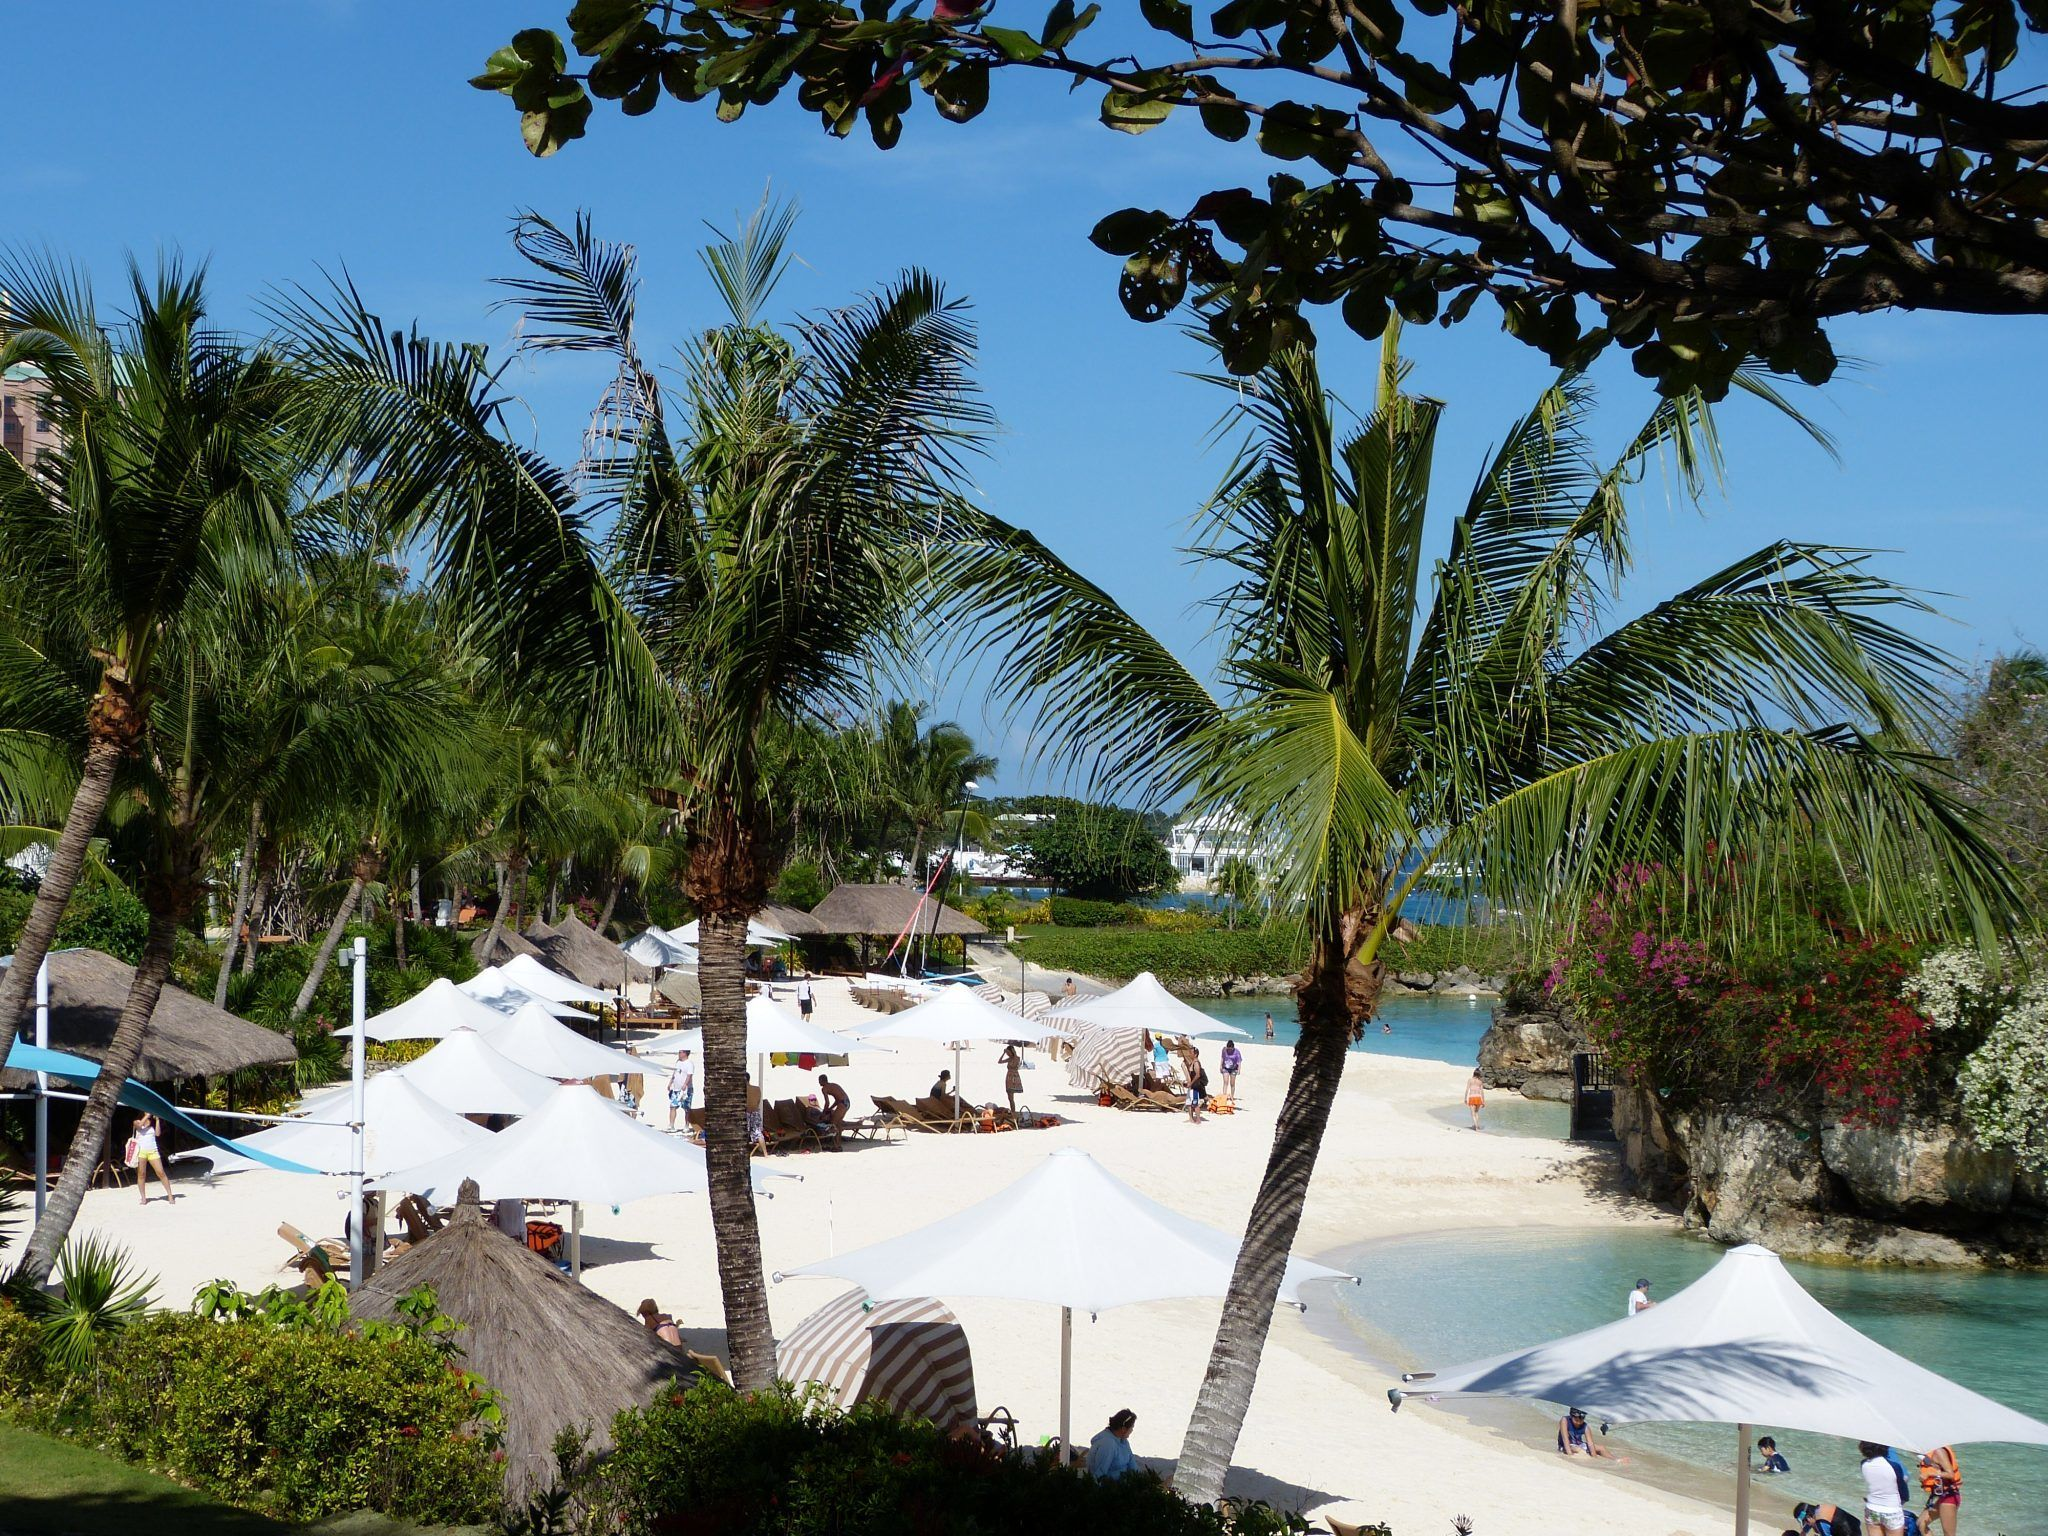 Beach of ShangriLa Mactan in Cebu. Philiippines